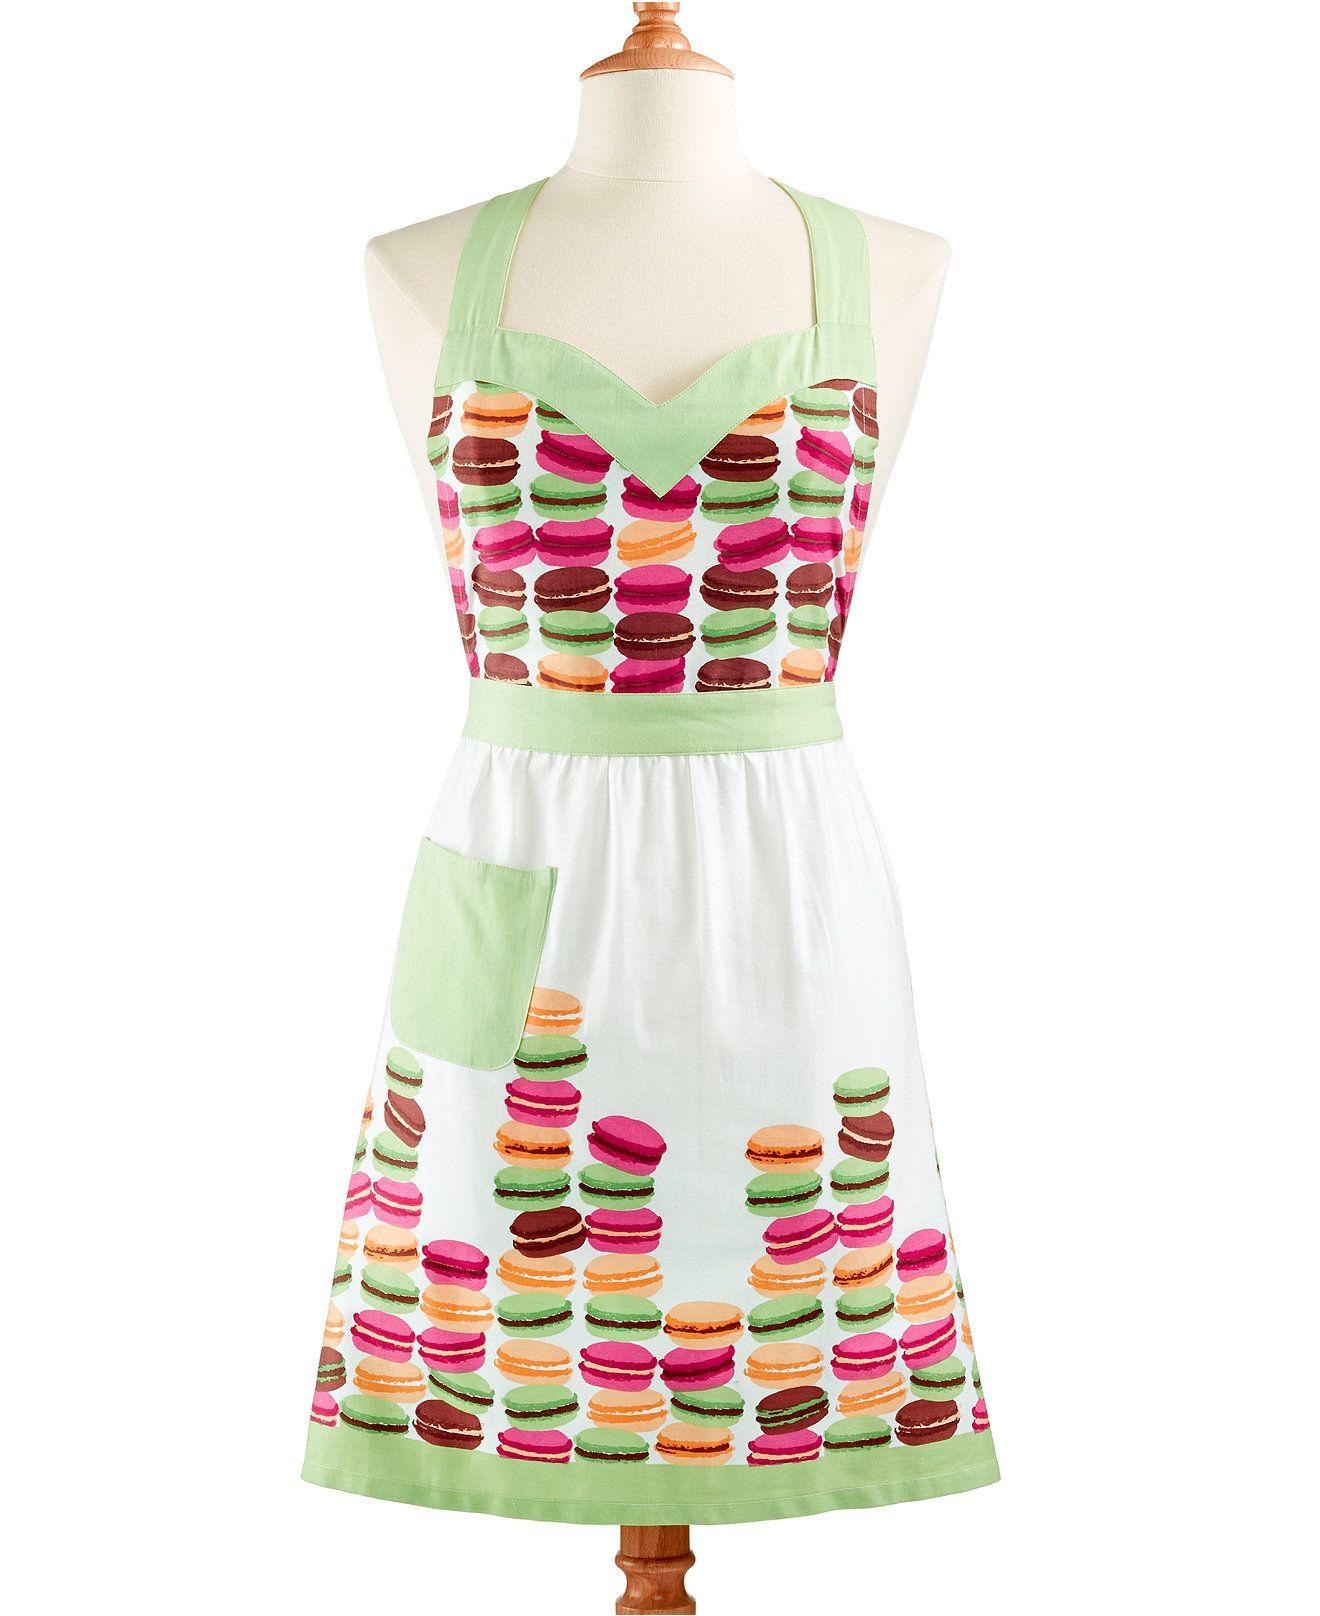 White apron macy's - Martha Stewart Collection Macaron Apron Kitchen Gadgets Kitchen Macy S